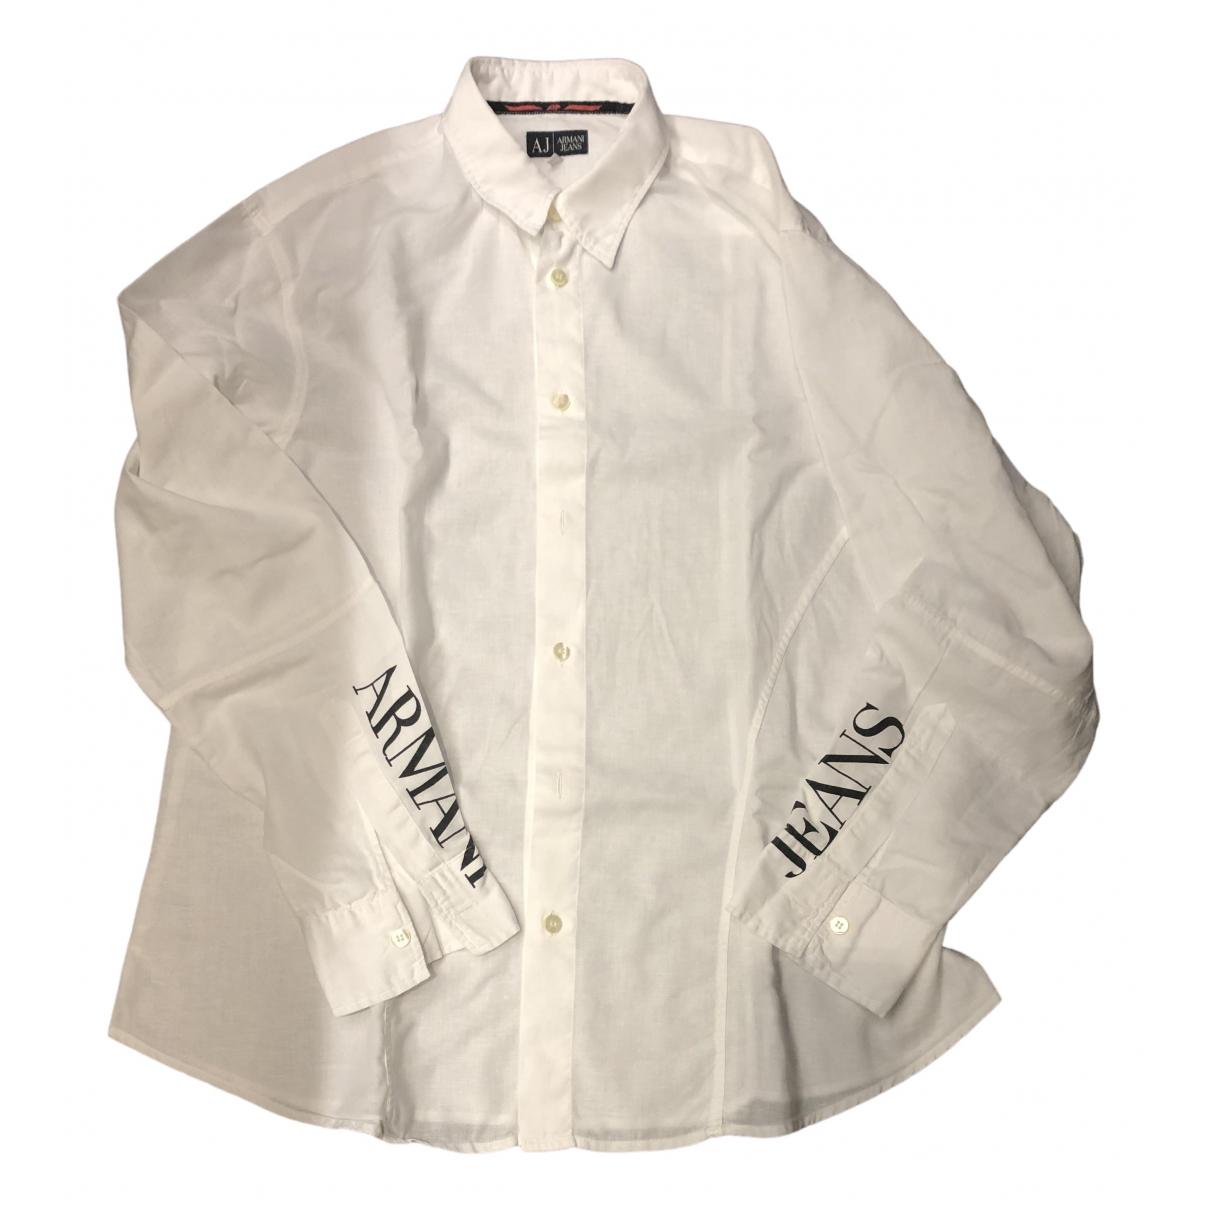 Camisas Armani Jeans